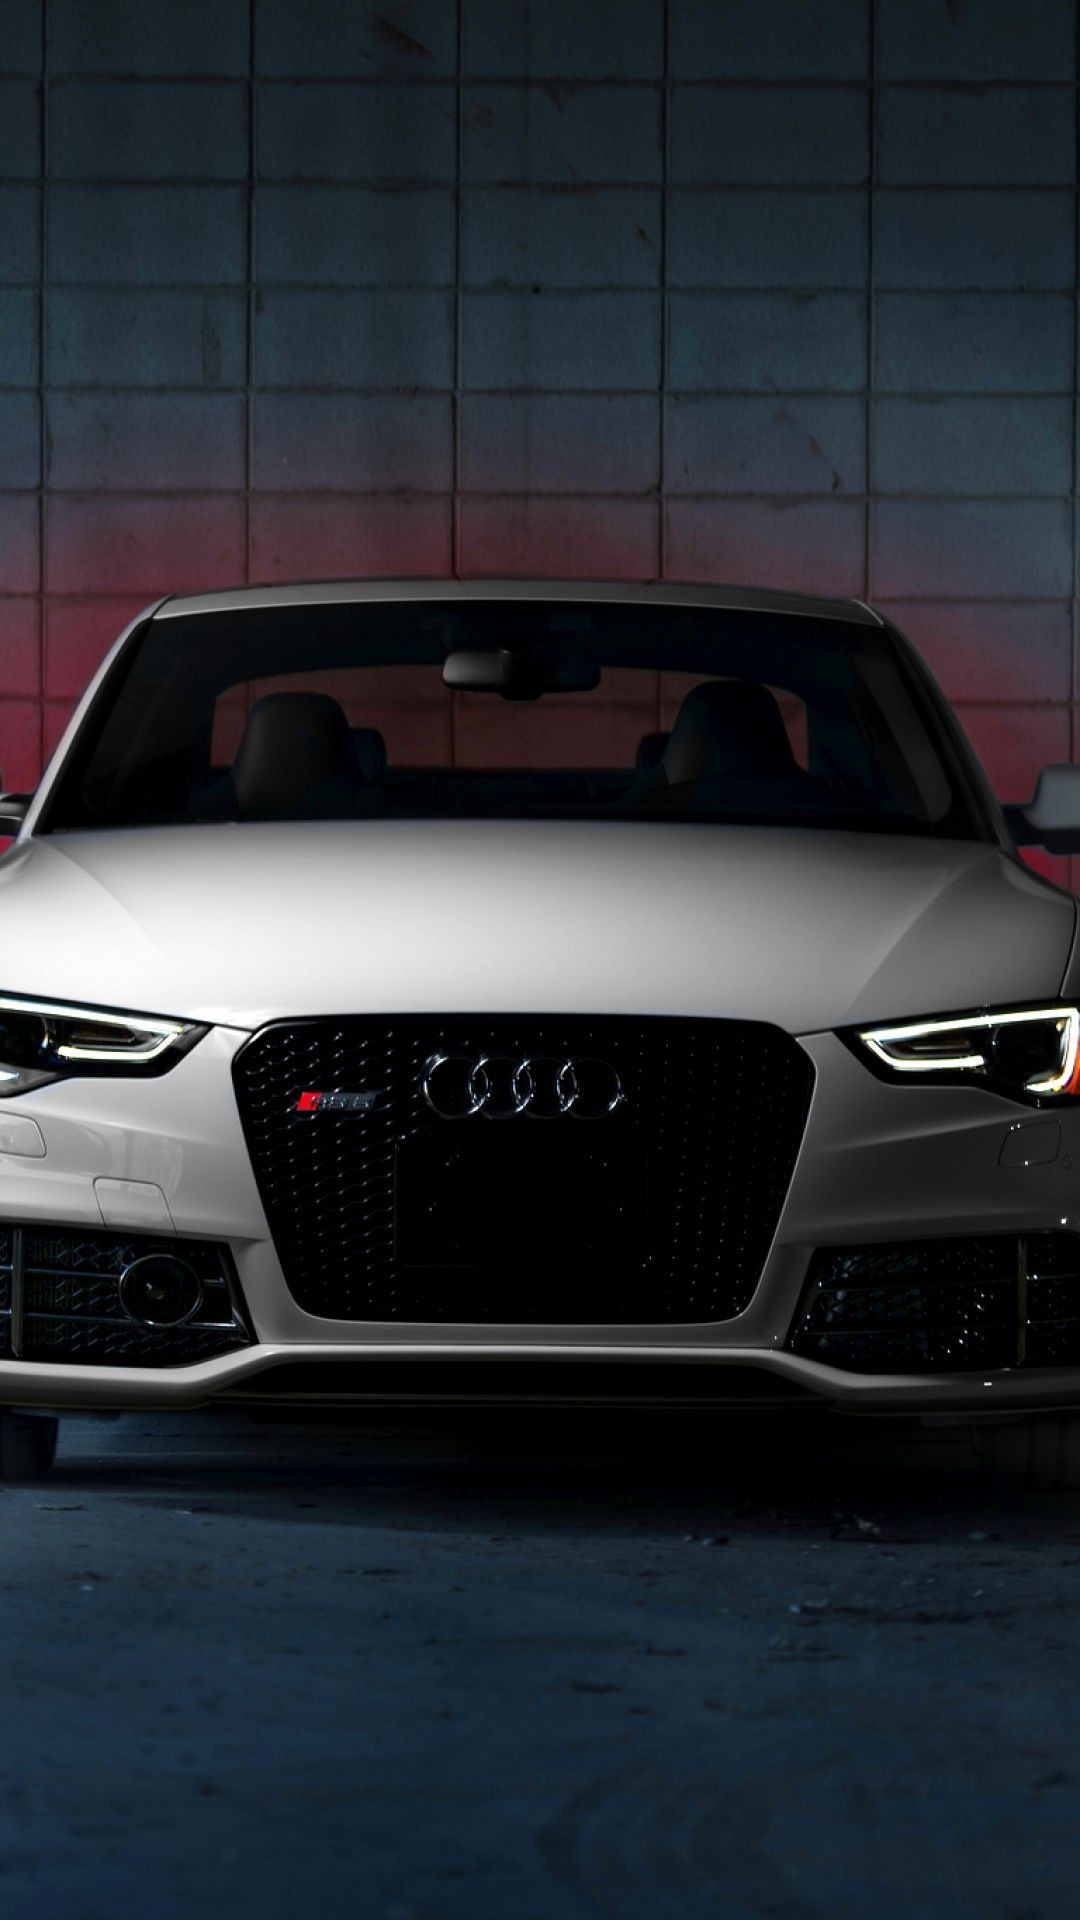 Galaxy S4 Car Wallpaper 1080x1920 Audi Wallpapers 70 Images